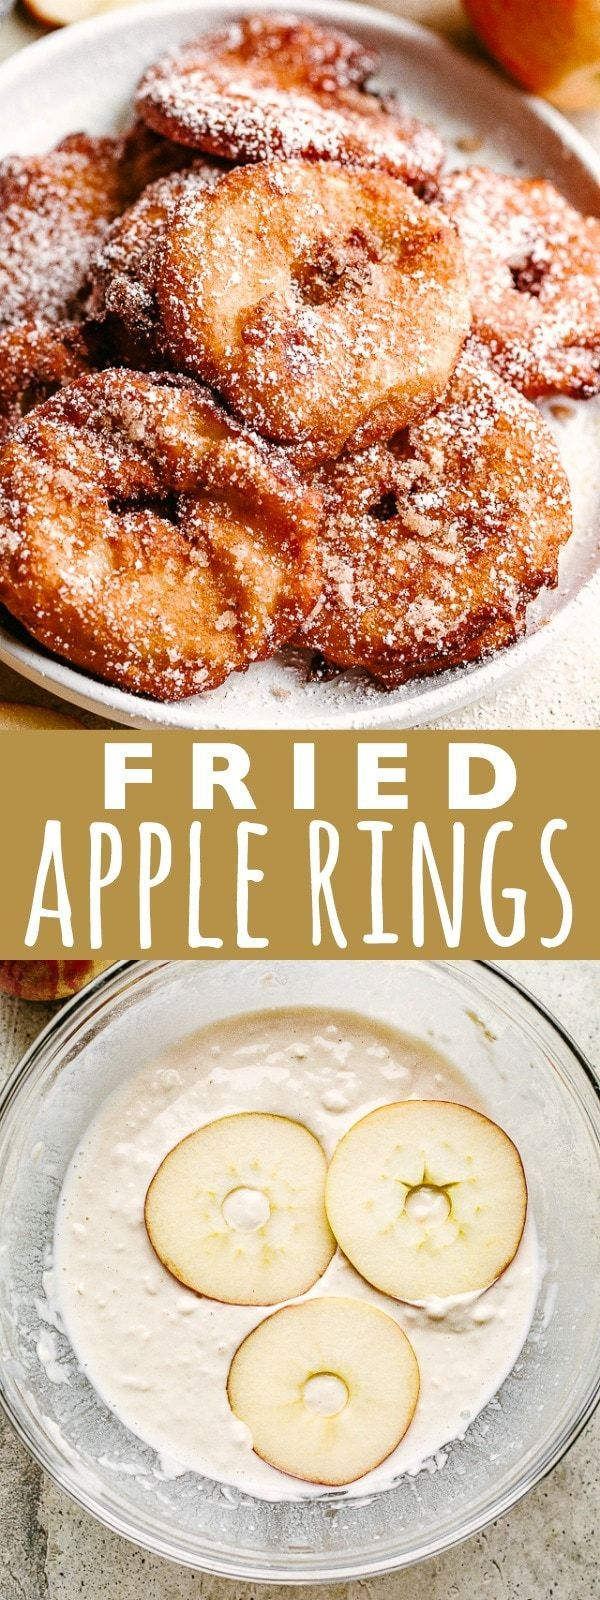 Apple Rings Recipe | Diethood #applerecipes